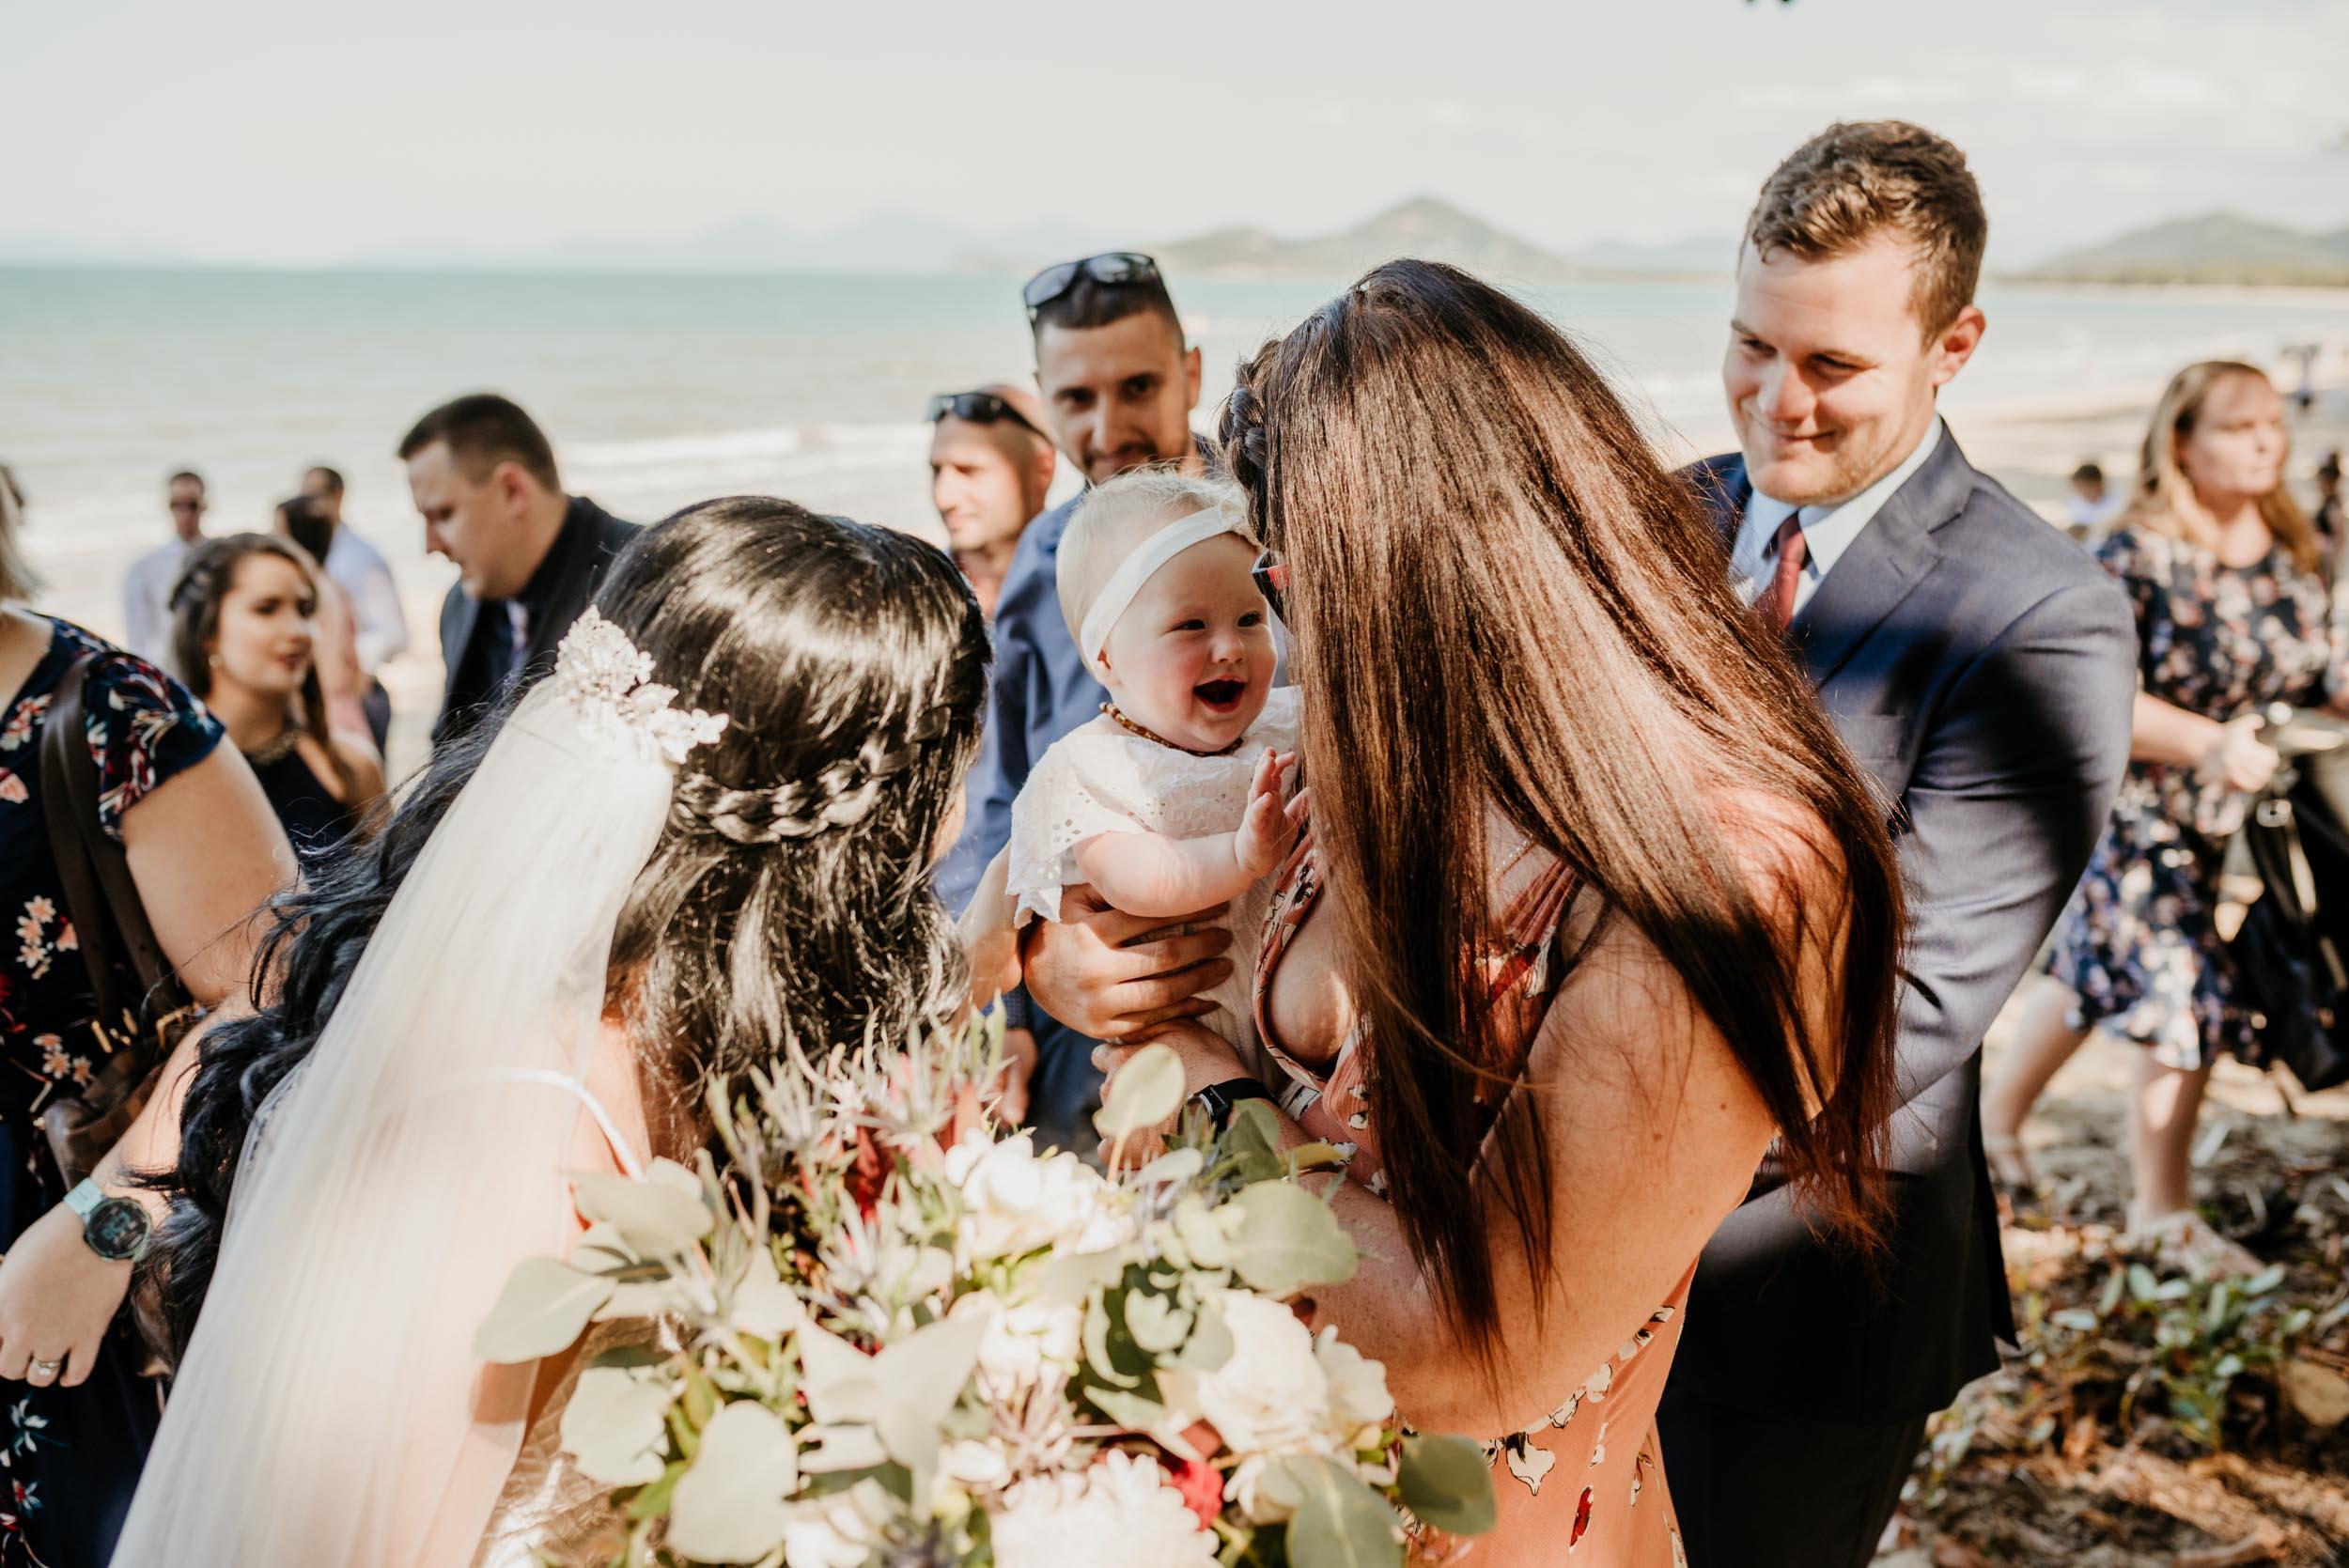 The Raw Photographer - Cairns Wedding Photographer - Beach Palm Cove Ceremony - Dress Irene Costa's Devine Bridal - Queensland-36.jpg